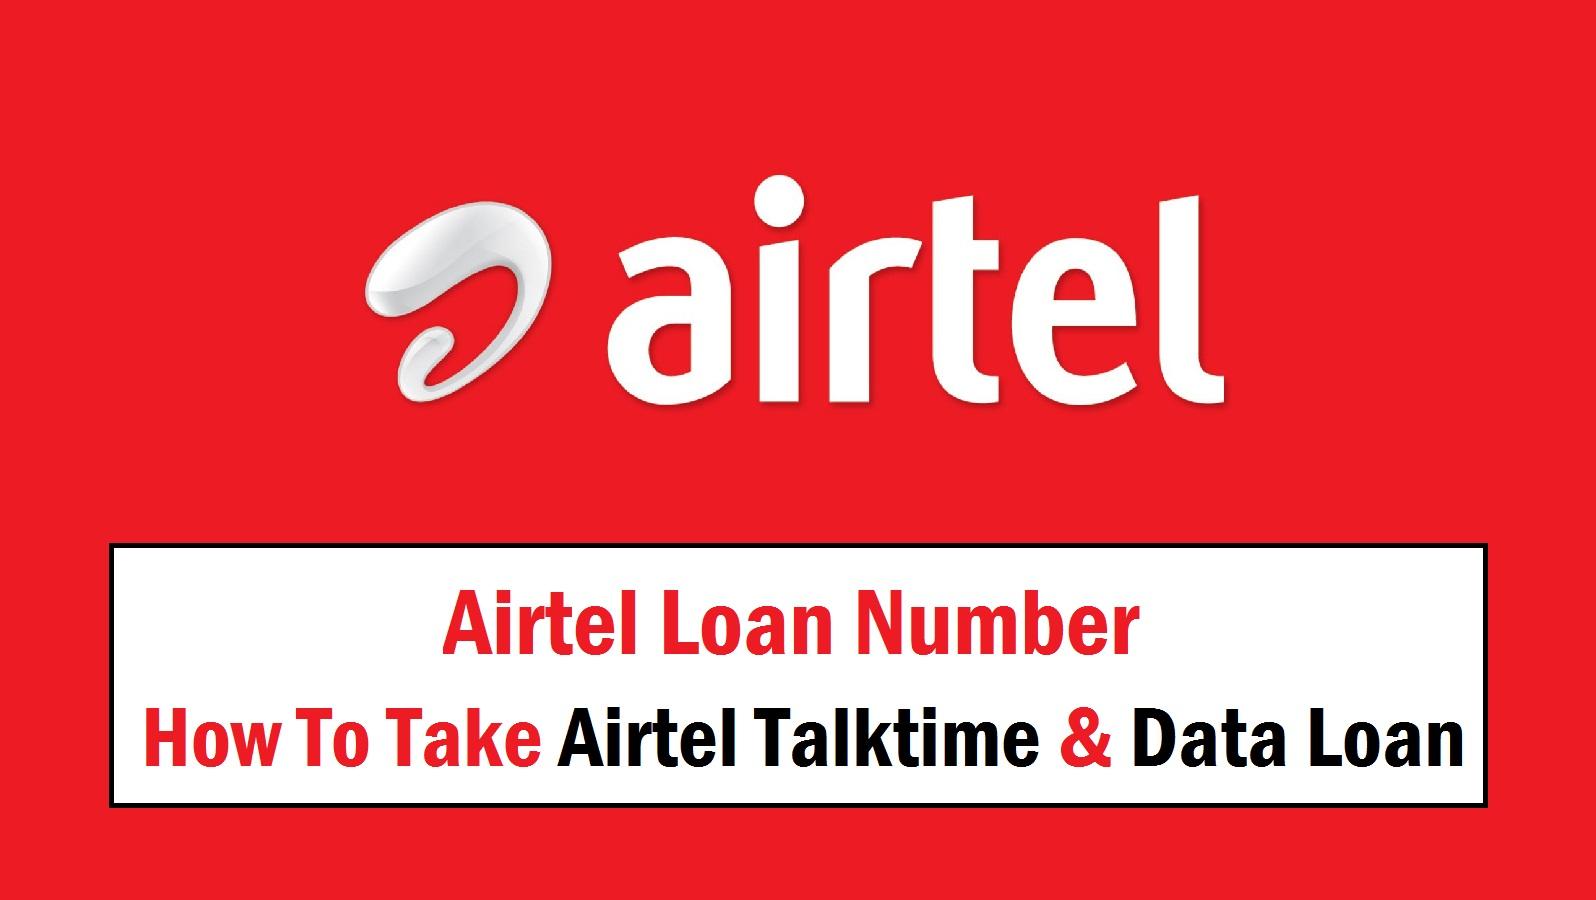 How to Take Airtel Talktime & Data Loan